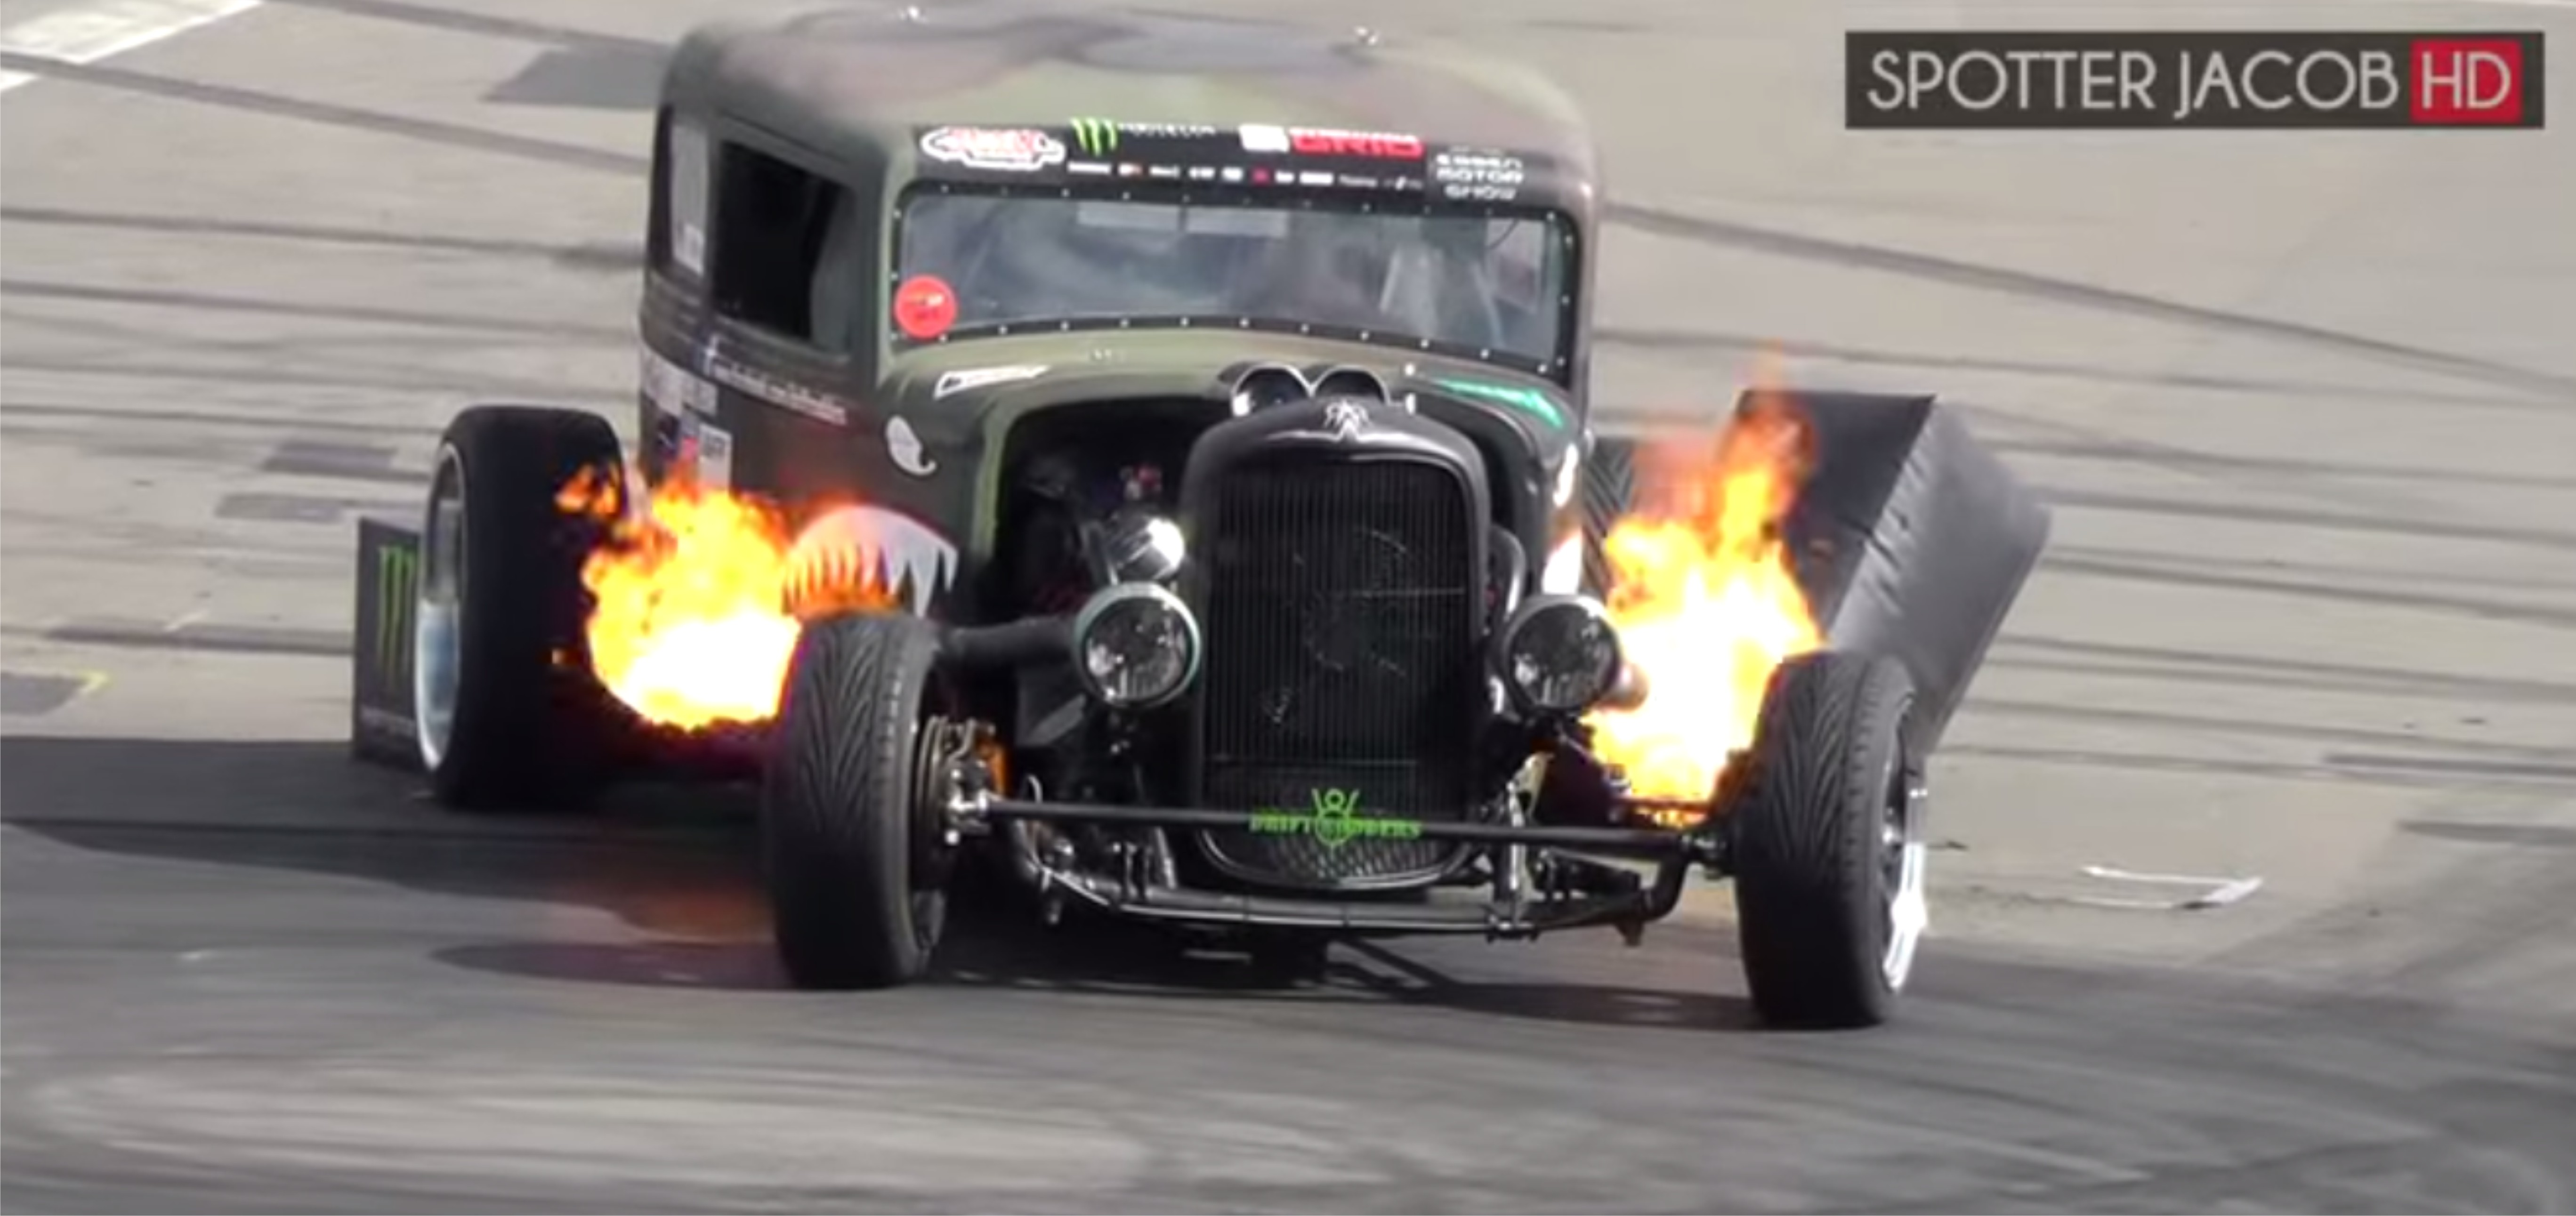 Rat Rod Archives - TOP HOT CARS